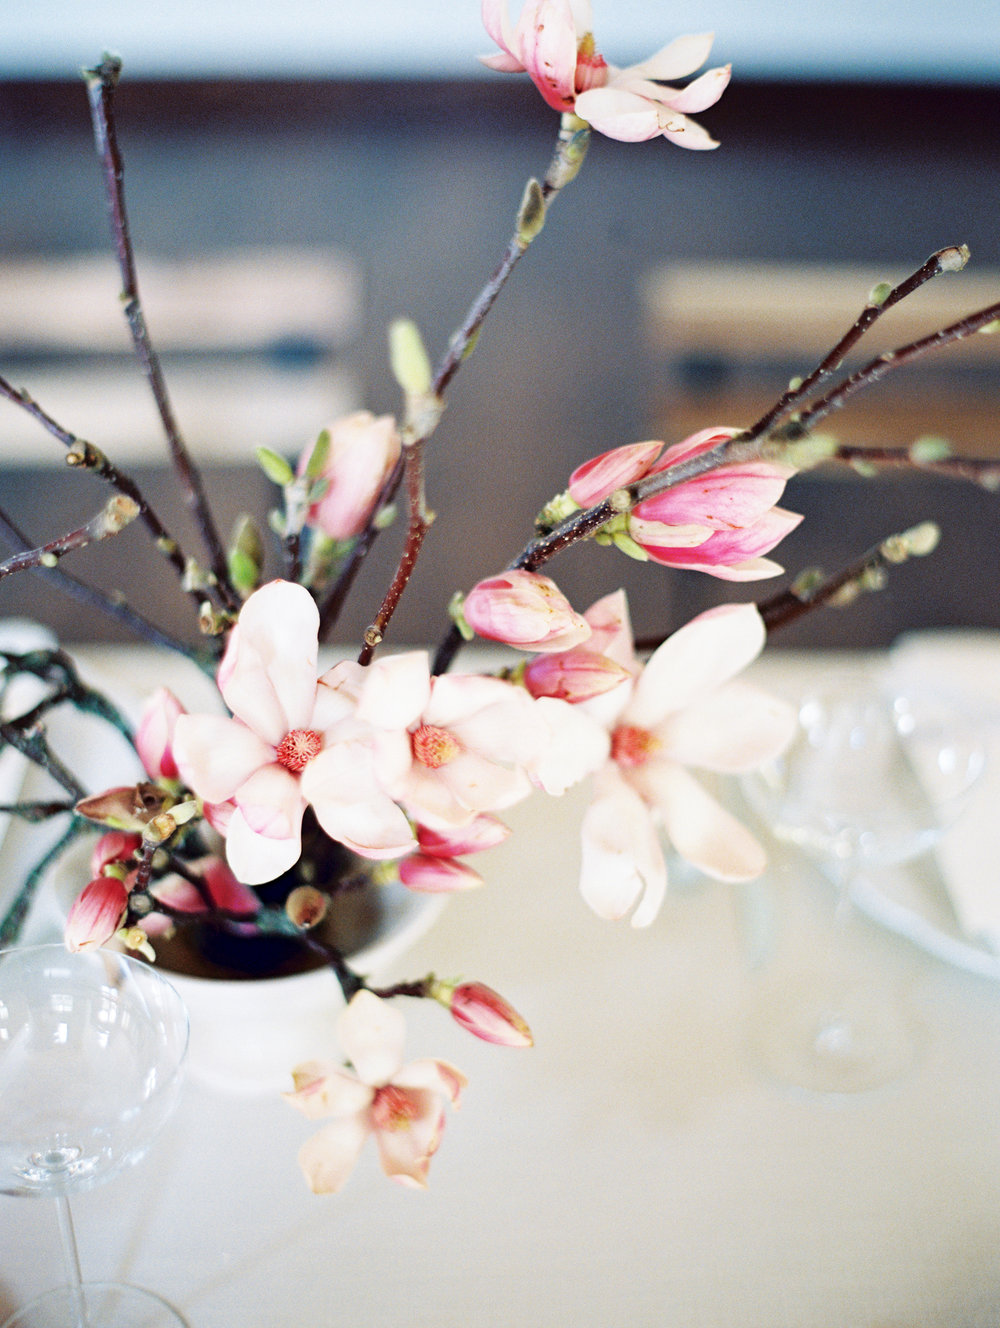 Magnolia_0170.jpg